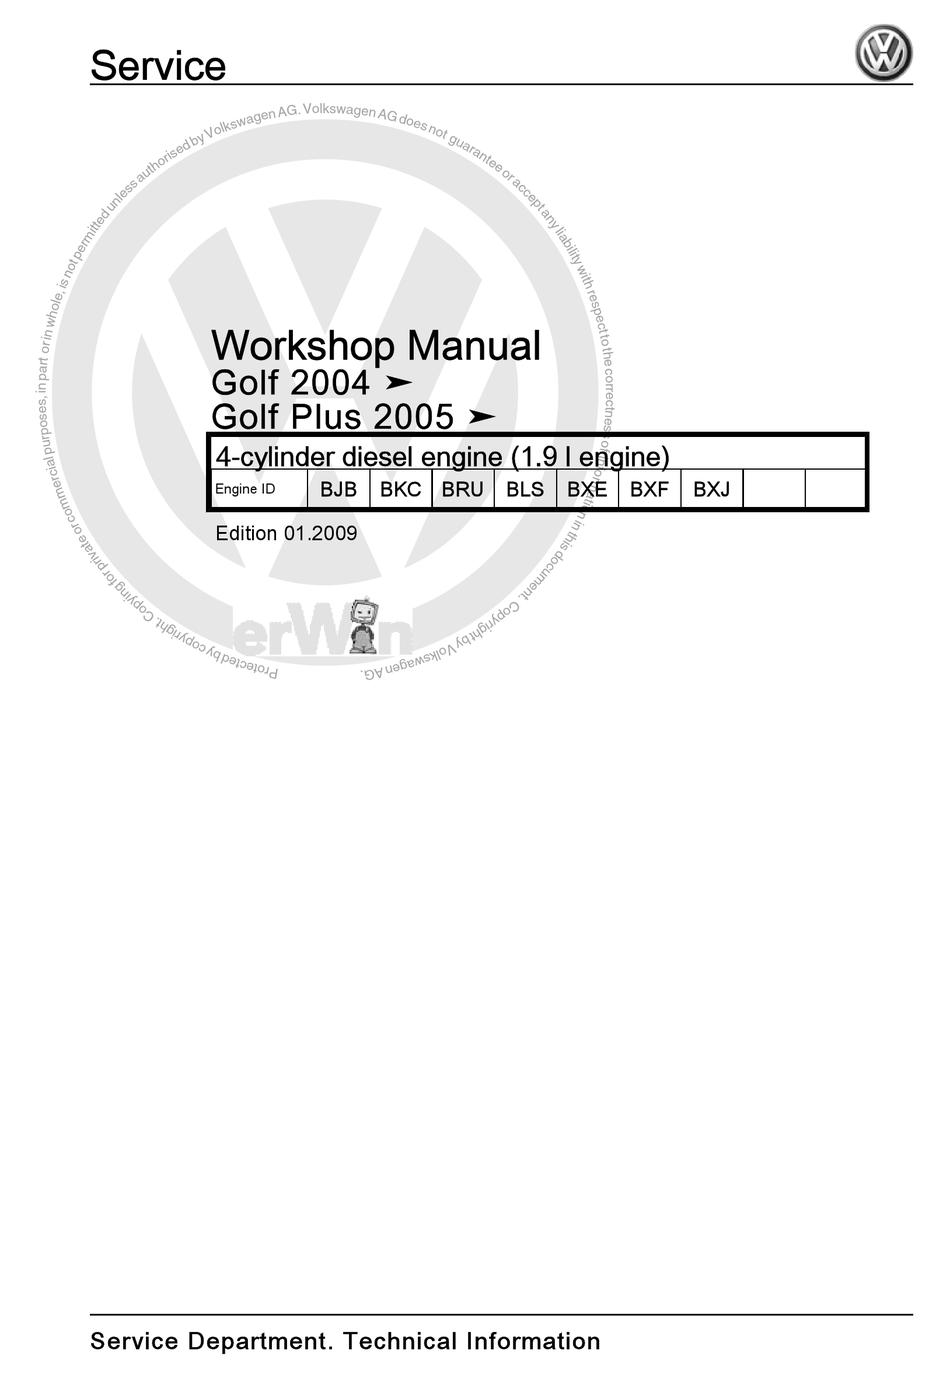 VOLKSWAGEN GOLF PLUS 2005 SERVICE MANUAL Pdf Download